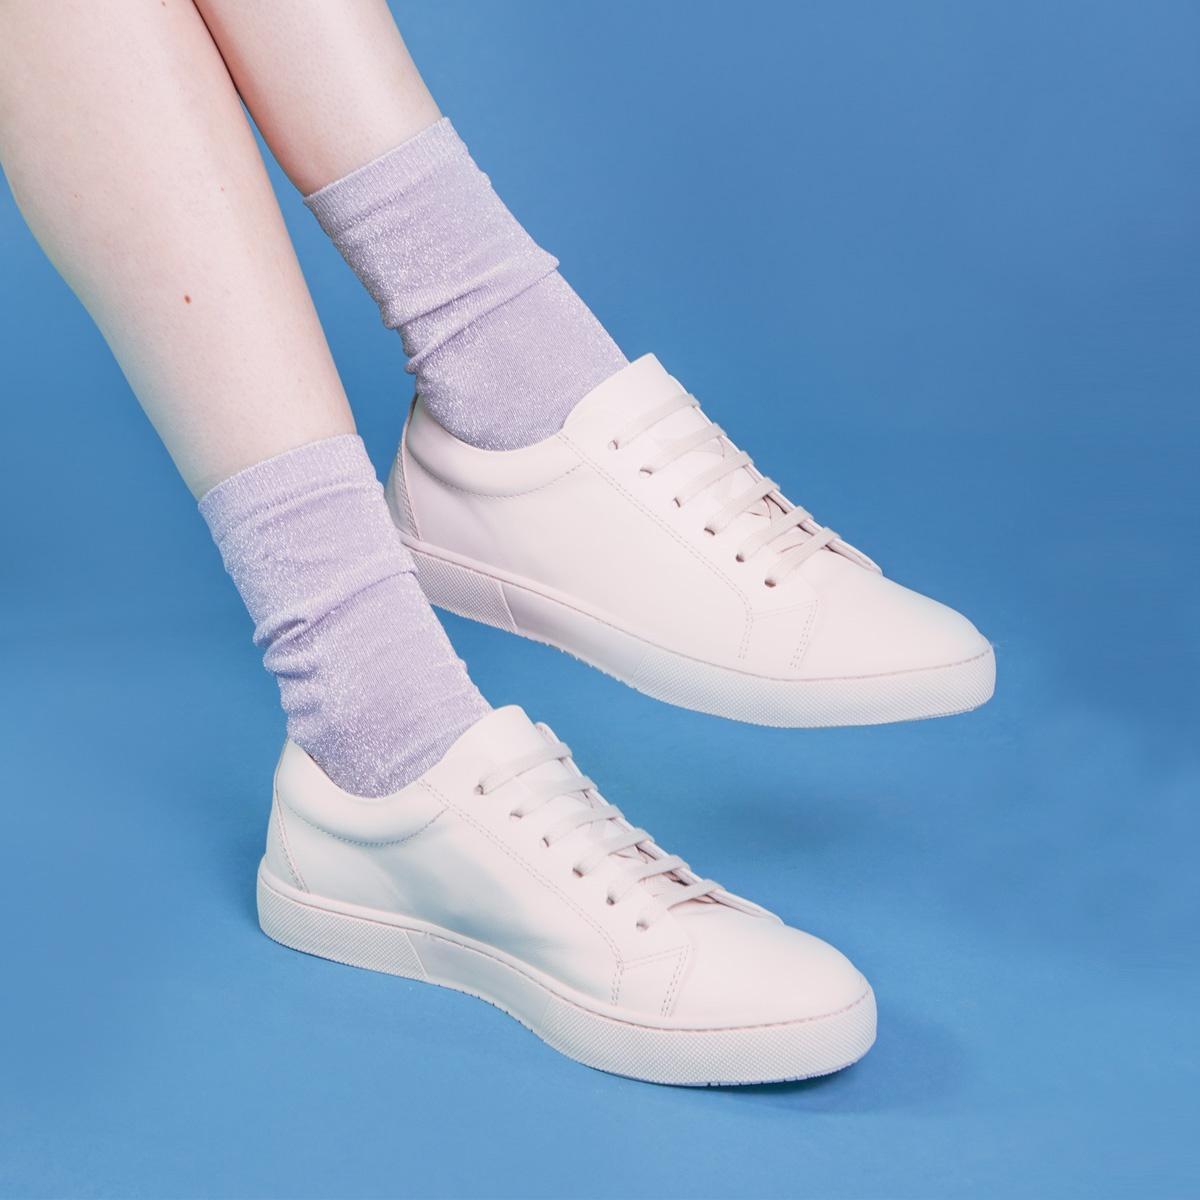 online retailer 89eae ee77e Sneaker in Pastellfarben